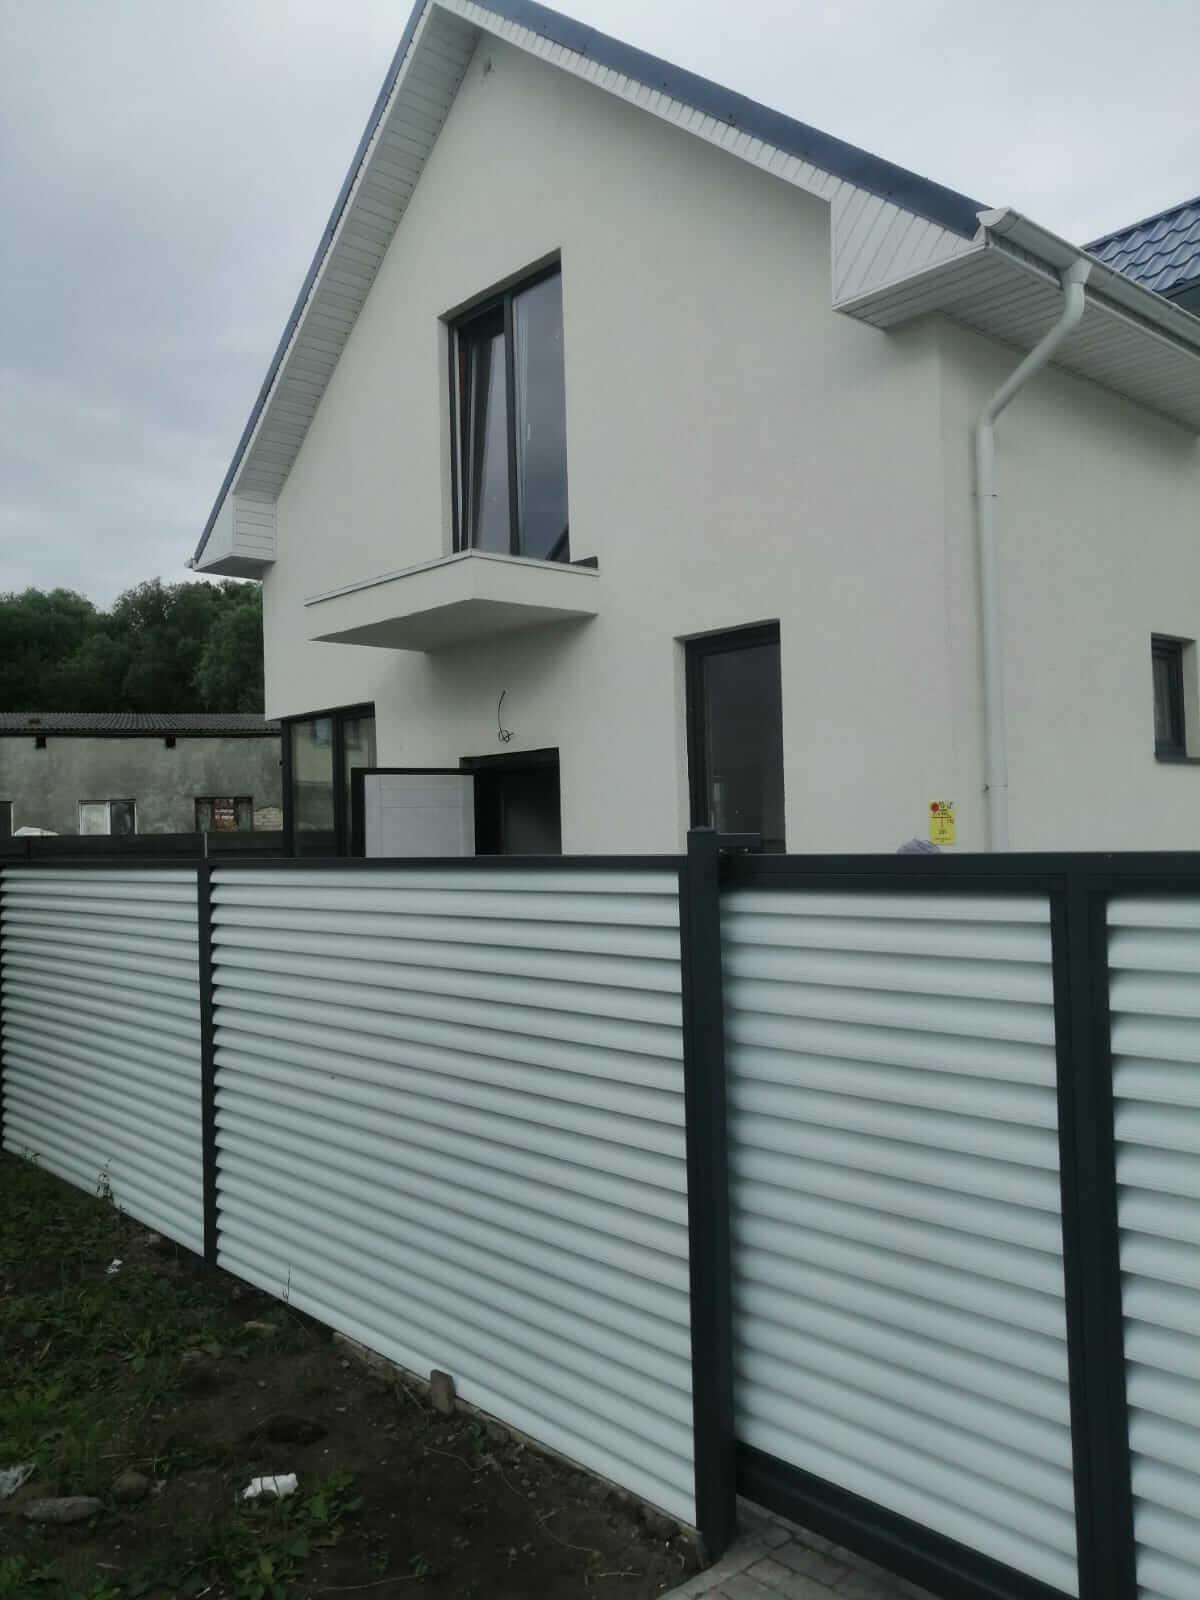 забор-жалюзи белый двухсторонний фото2